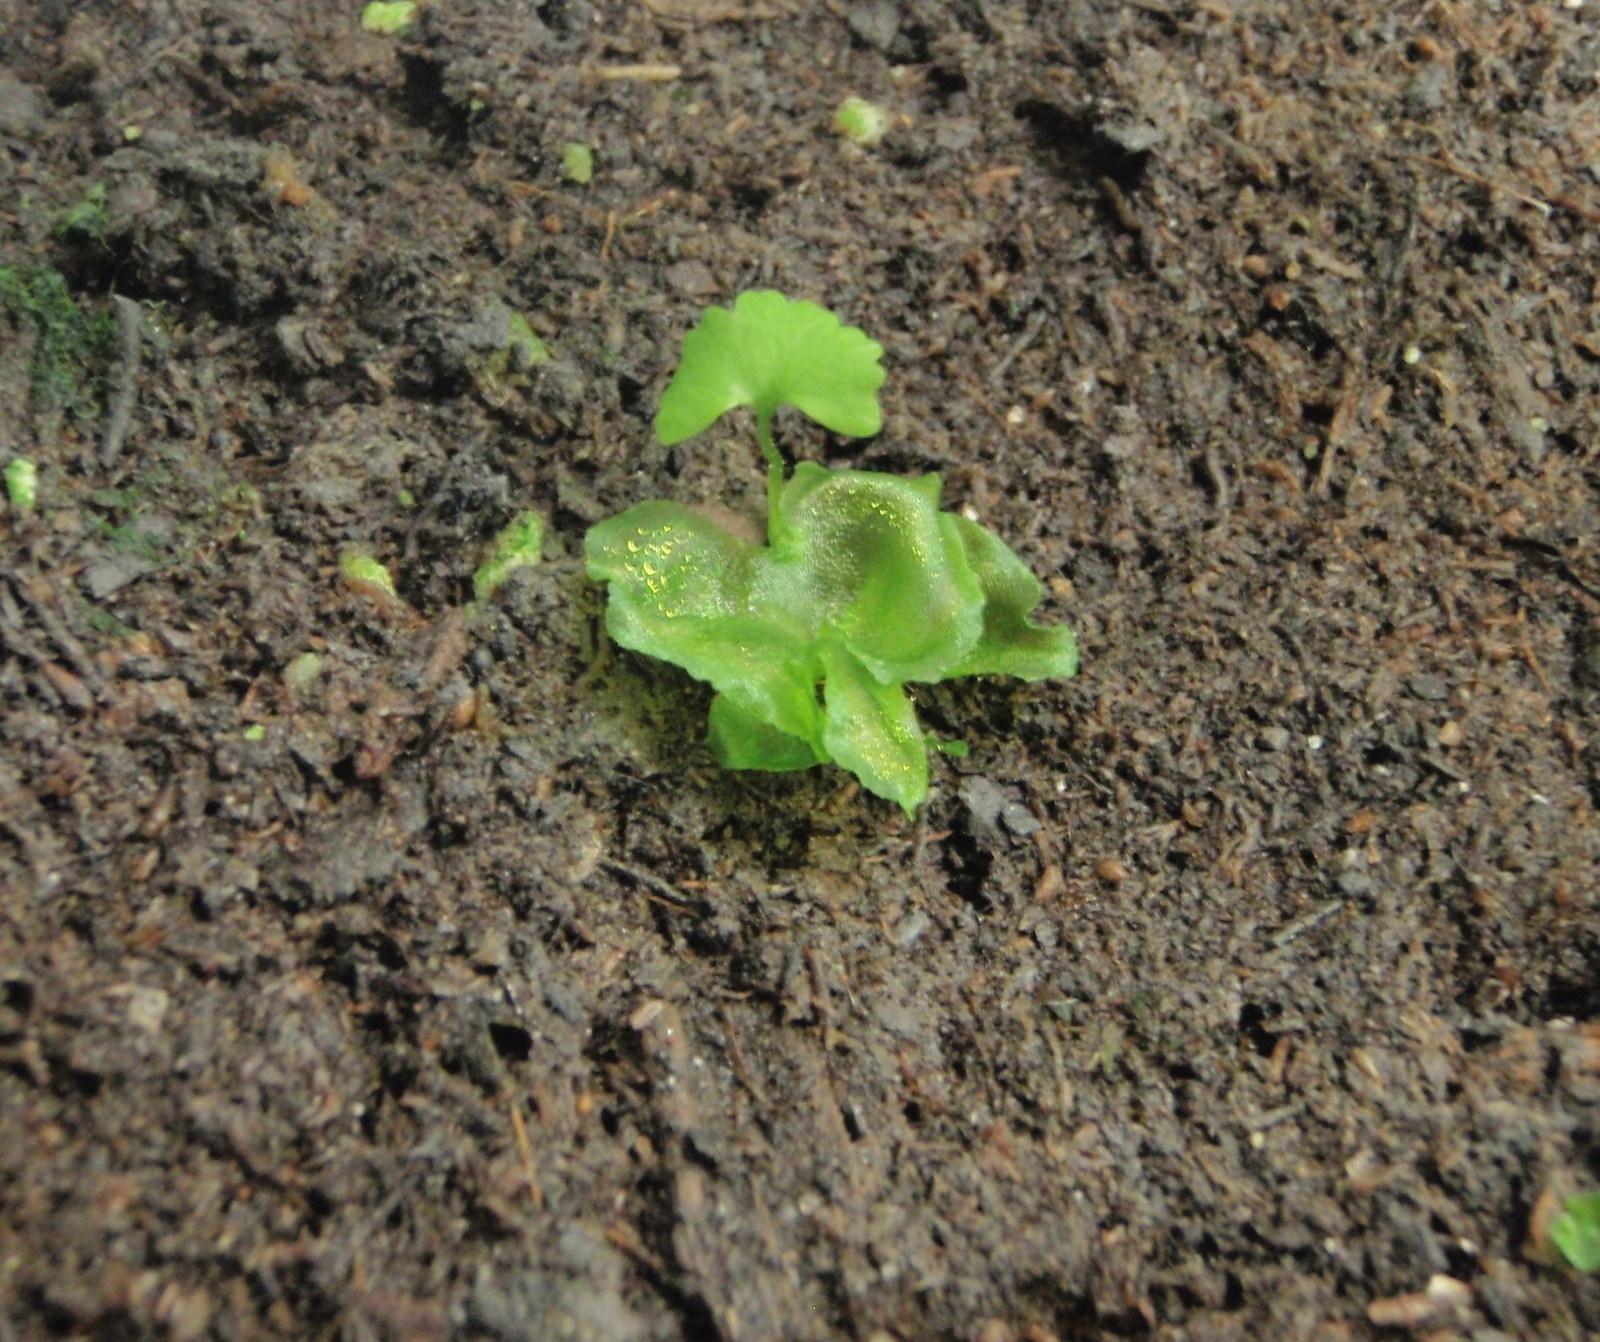 Onoclea_sensibilis_3_crop.JPG